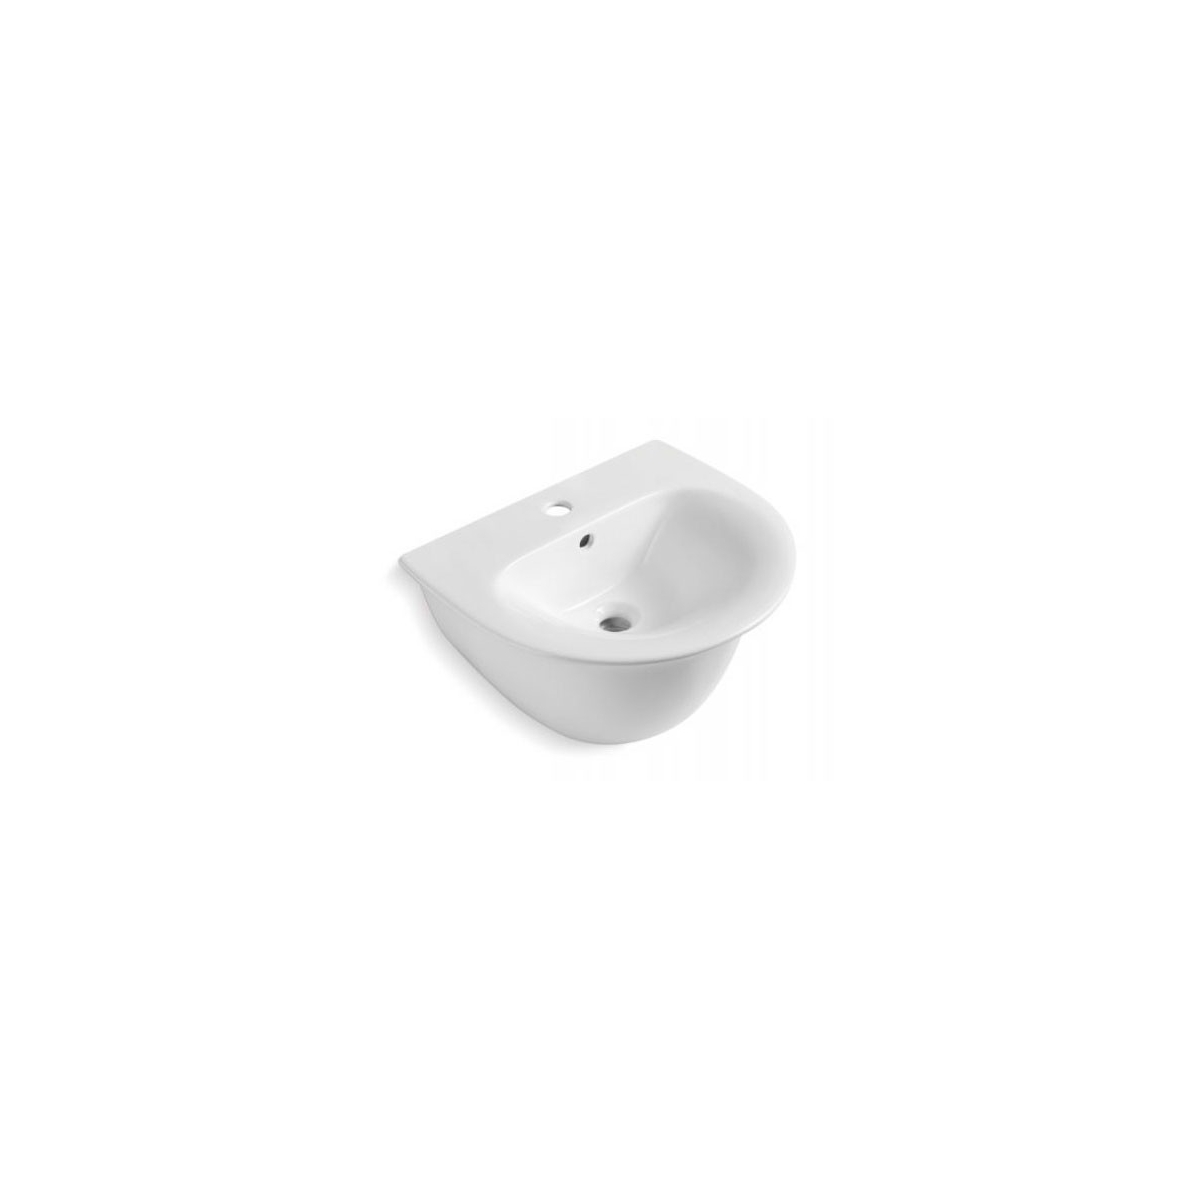 Lavabo Oval Gante - Lavabos ovales - Marca The Bathco